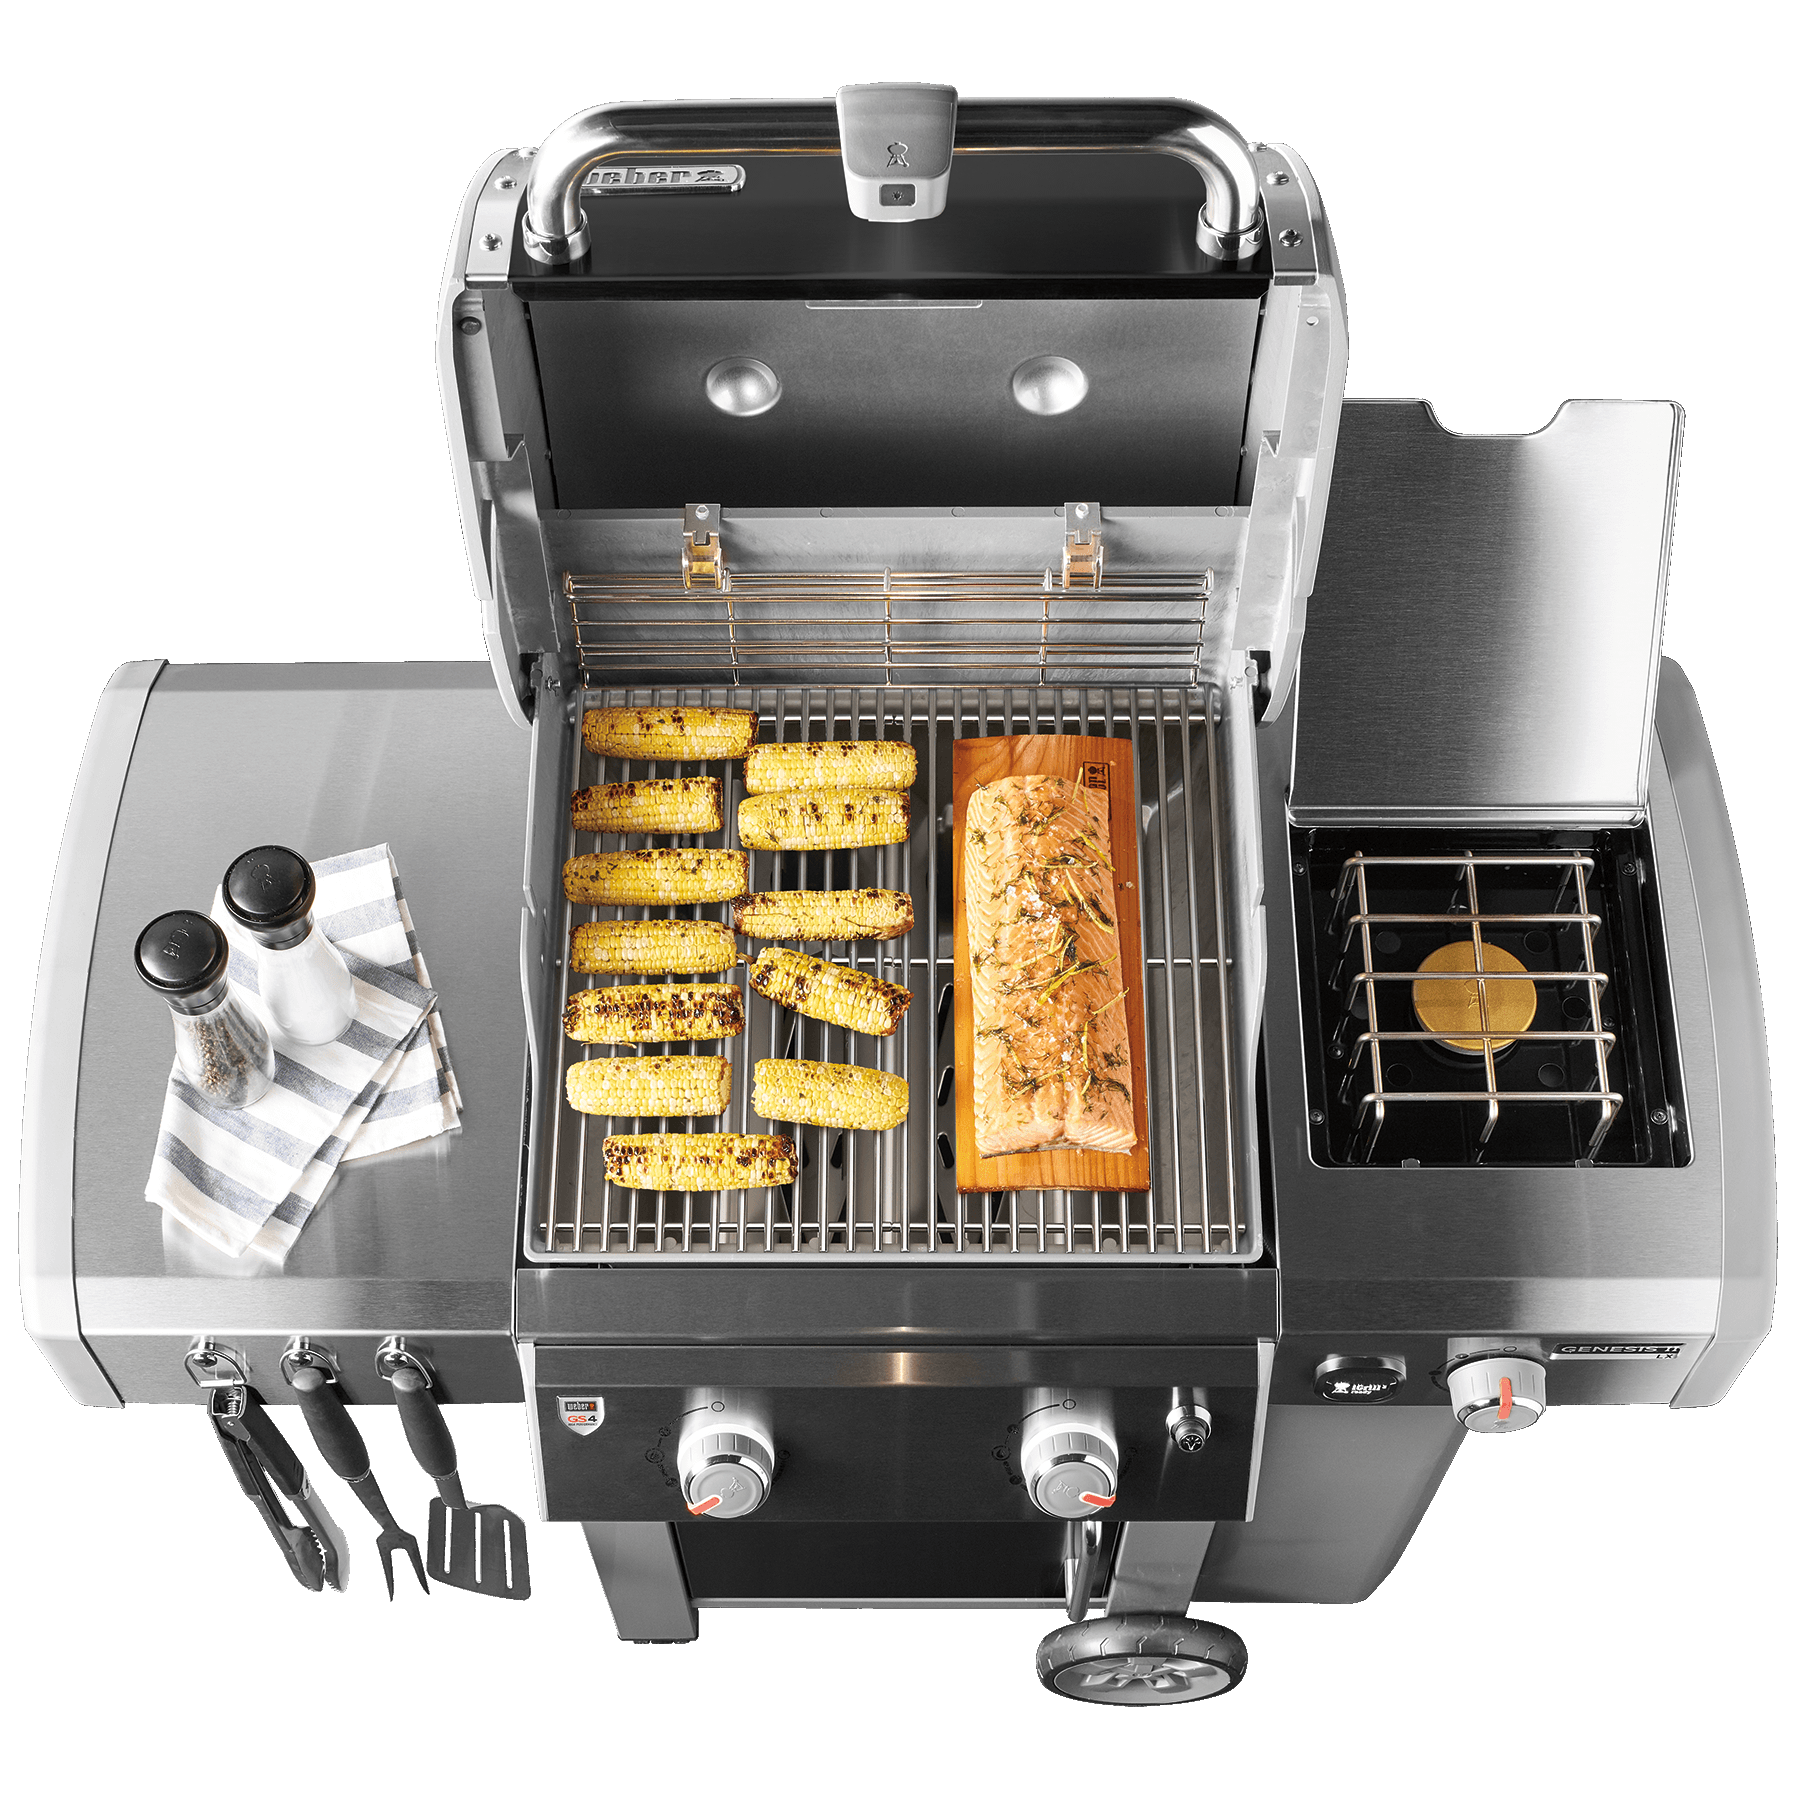 Barbacoa de gas Genesis® II LX E-240 GBS